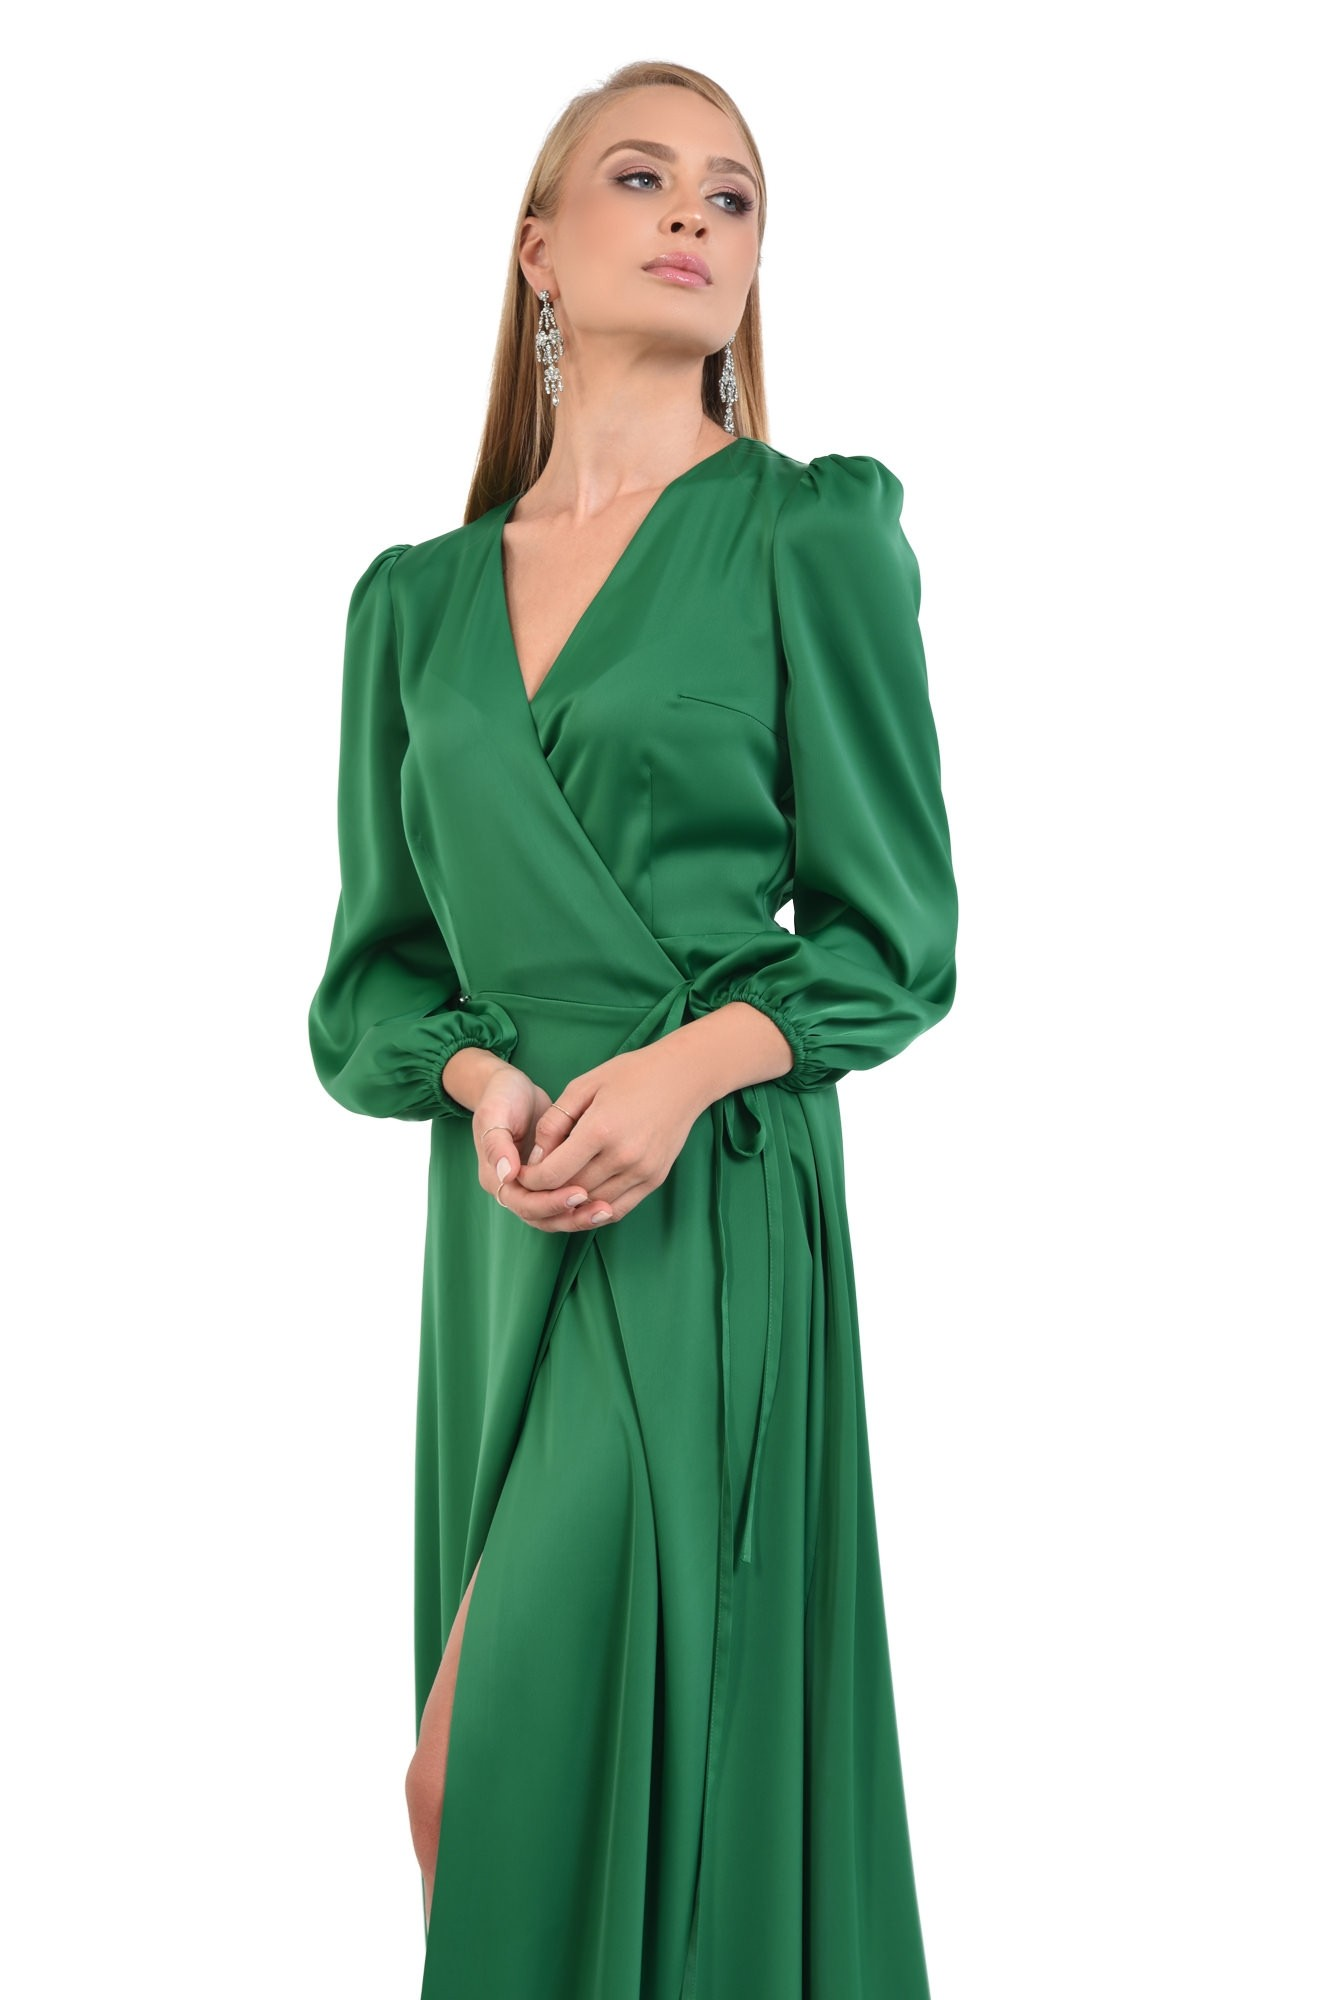 0 - rochie de seara, slit adanc, verde, satin, rochie maxi